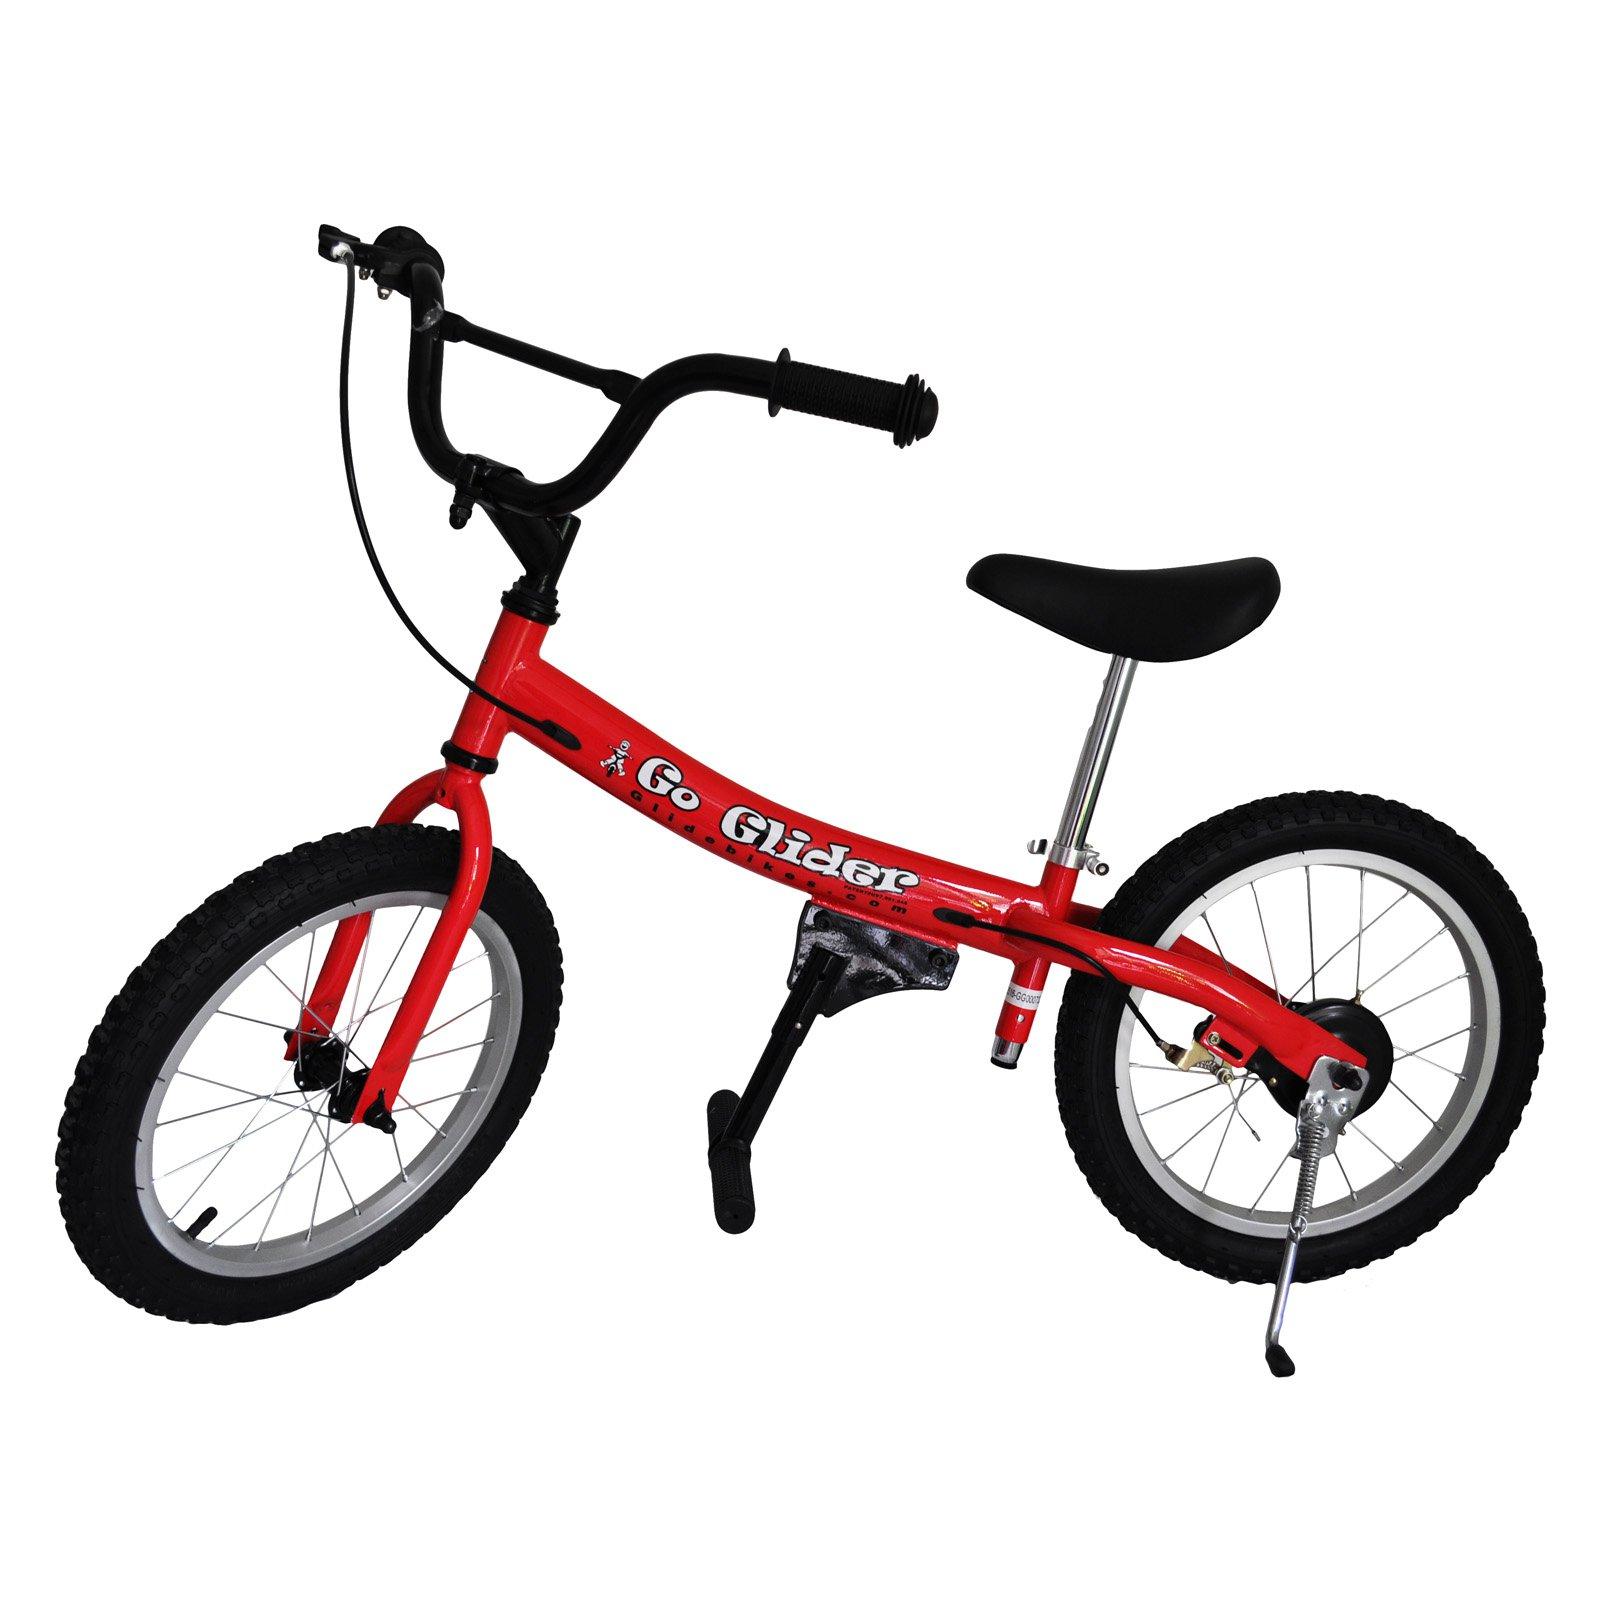 Glide Bikes Inc Glide Bikes 16 In. Go Glider Balance Bike  -  Red